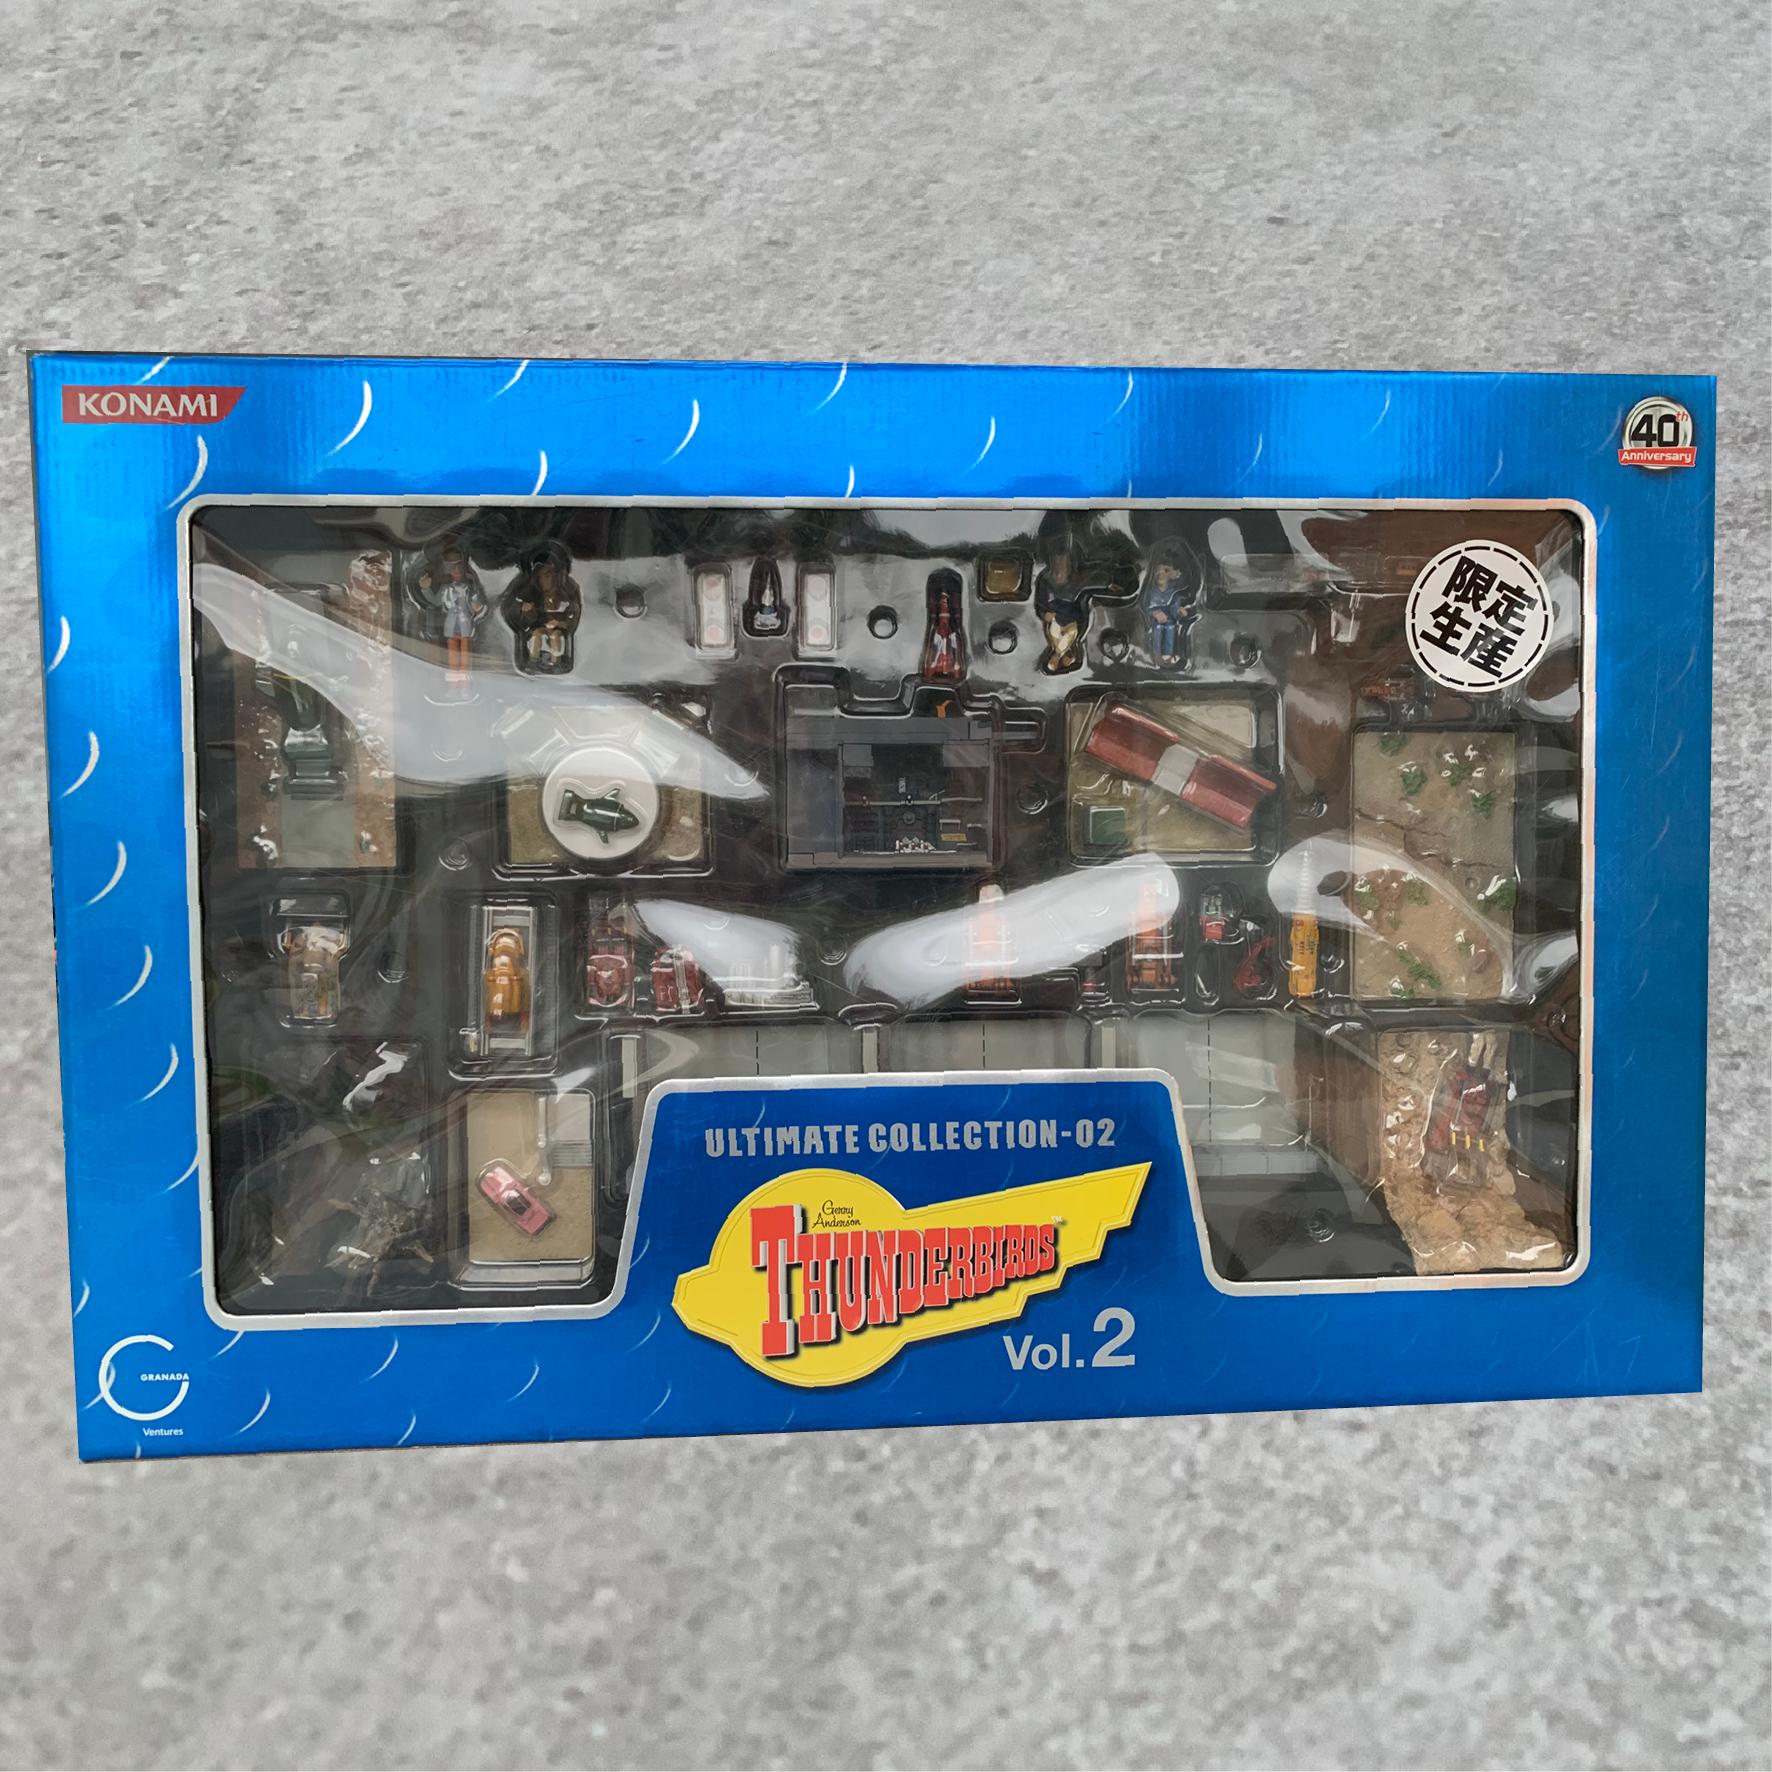 Supercelebration Treasure 2: Konami Thunderbirds, Scarlet costume and Harrops Mole